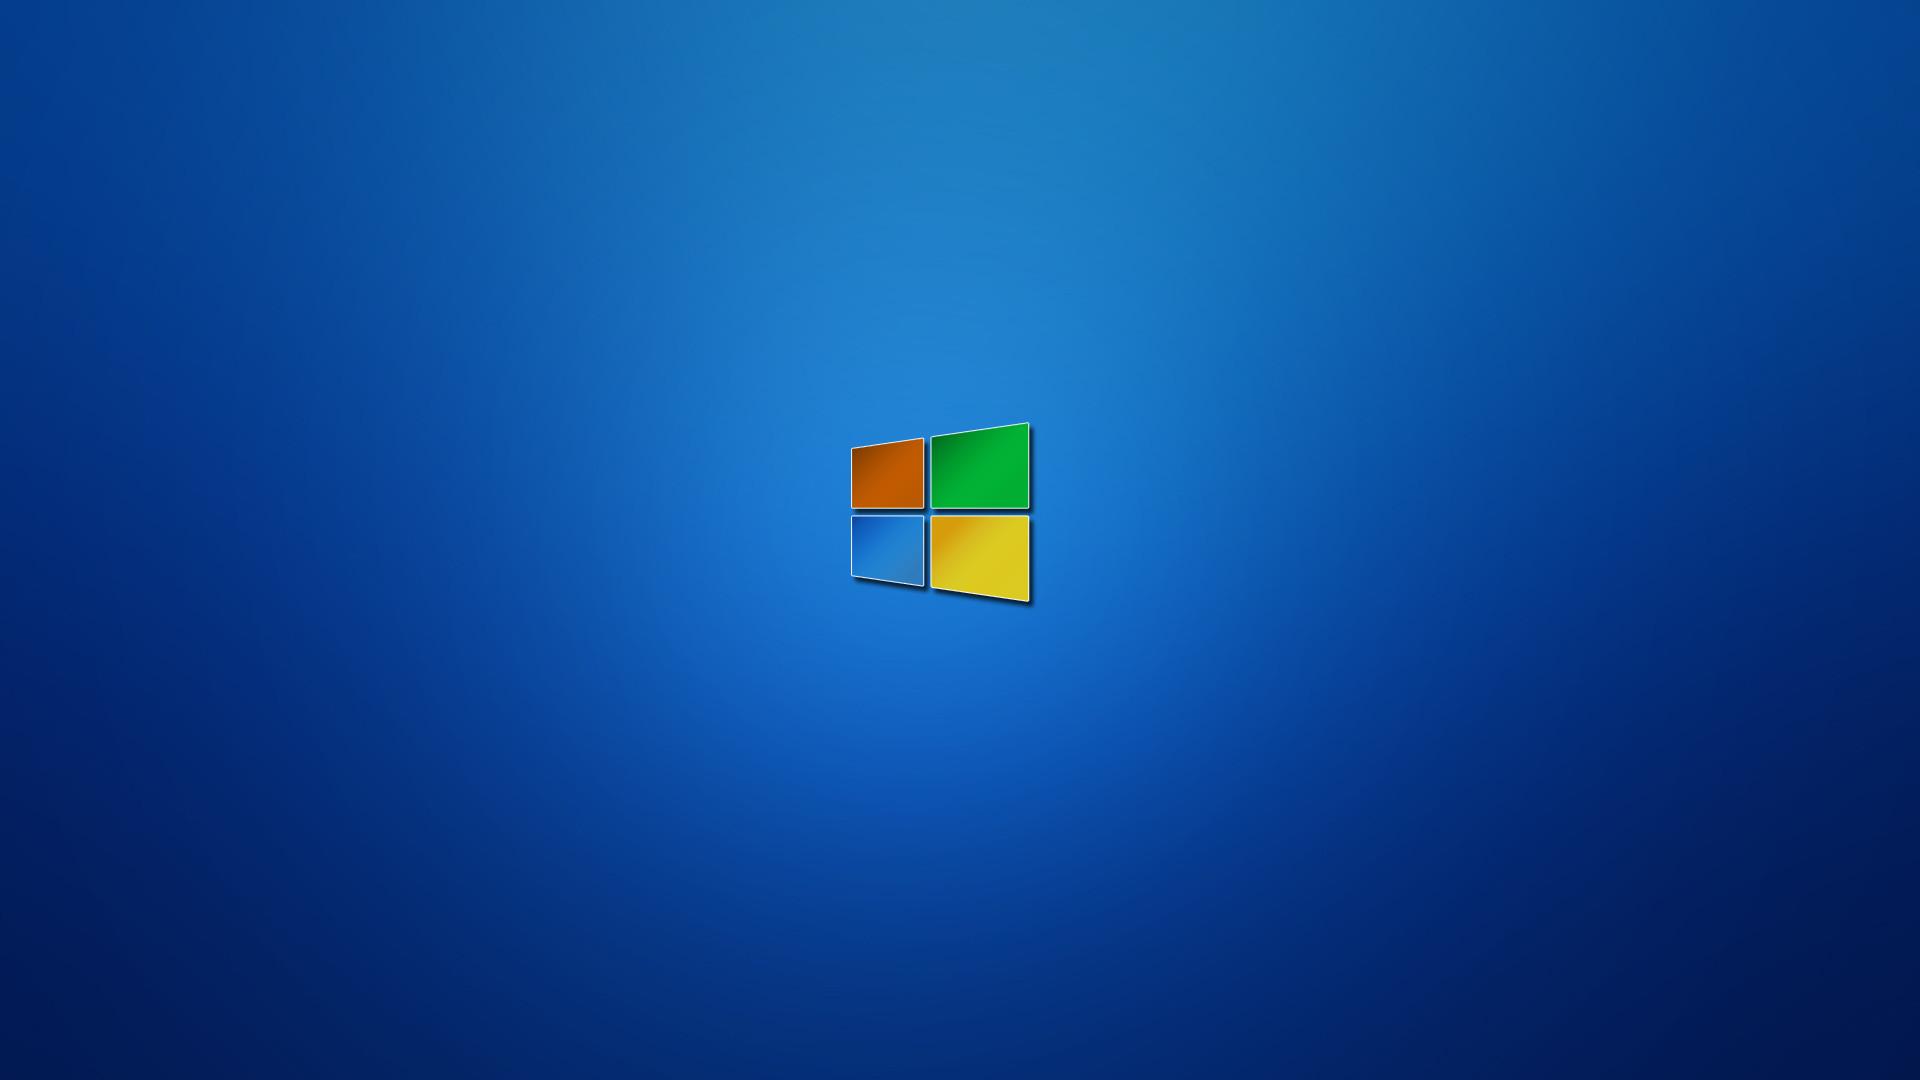 Classic windows desktop wallpaper 66 images - Hd wallpapers for pc windows ...